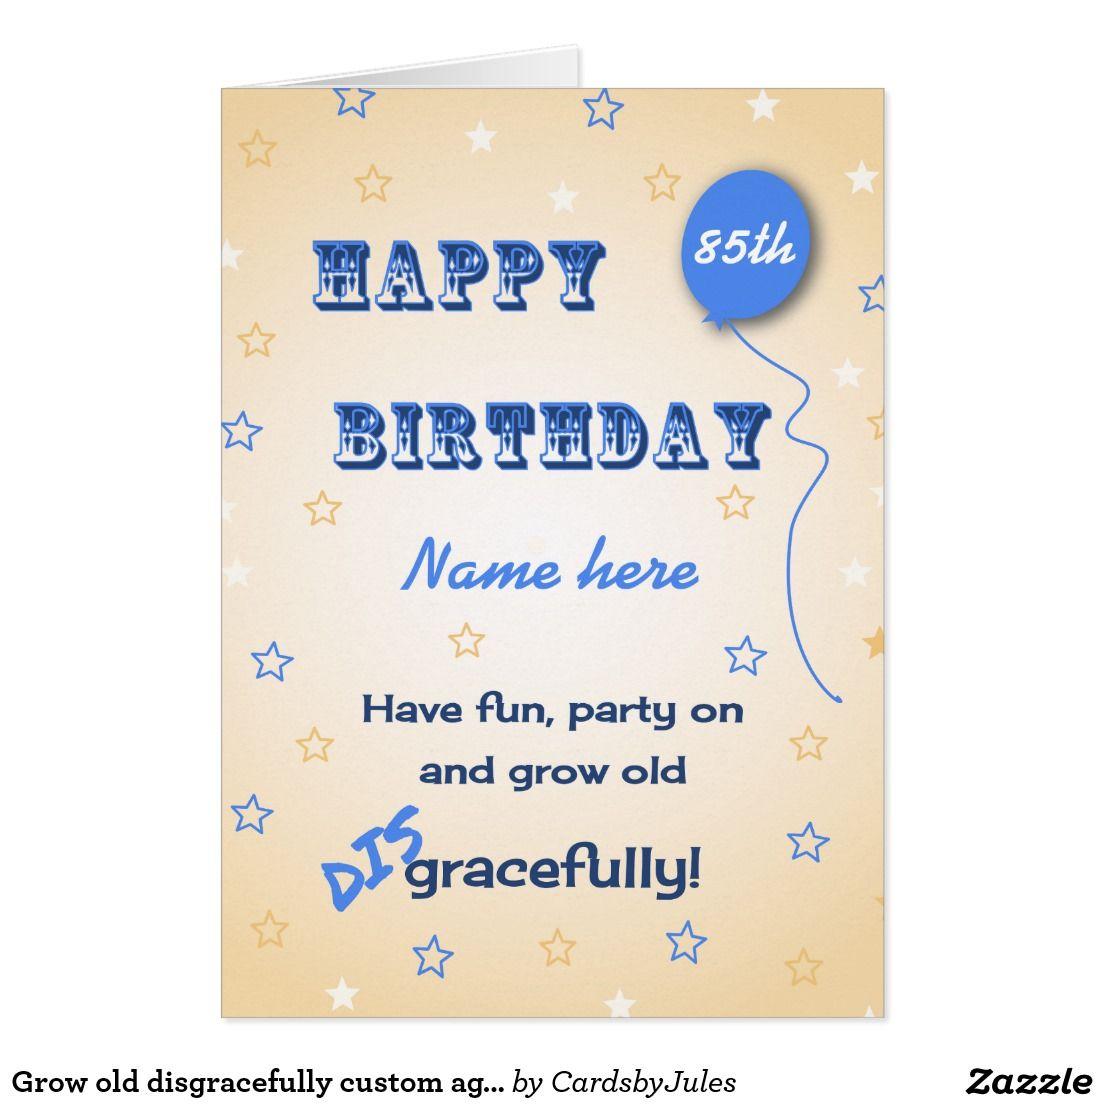 Grow Old Disgracefully Custom Age 85th Birthday Card UK Customer